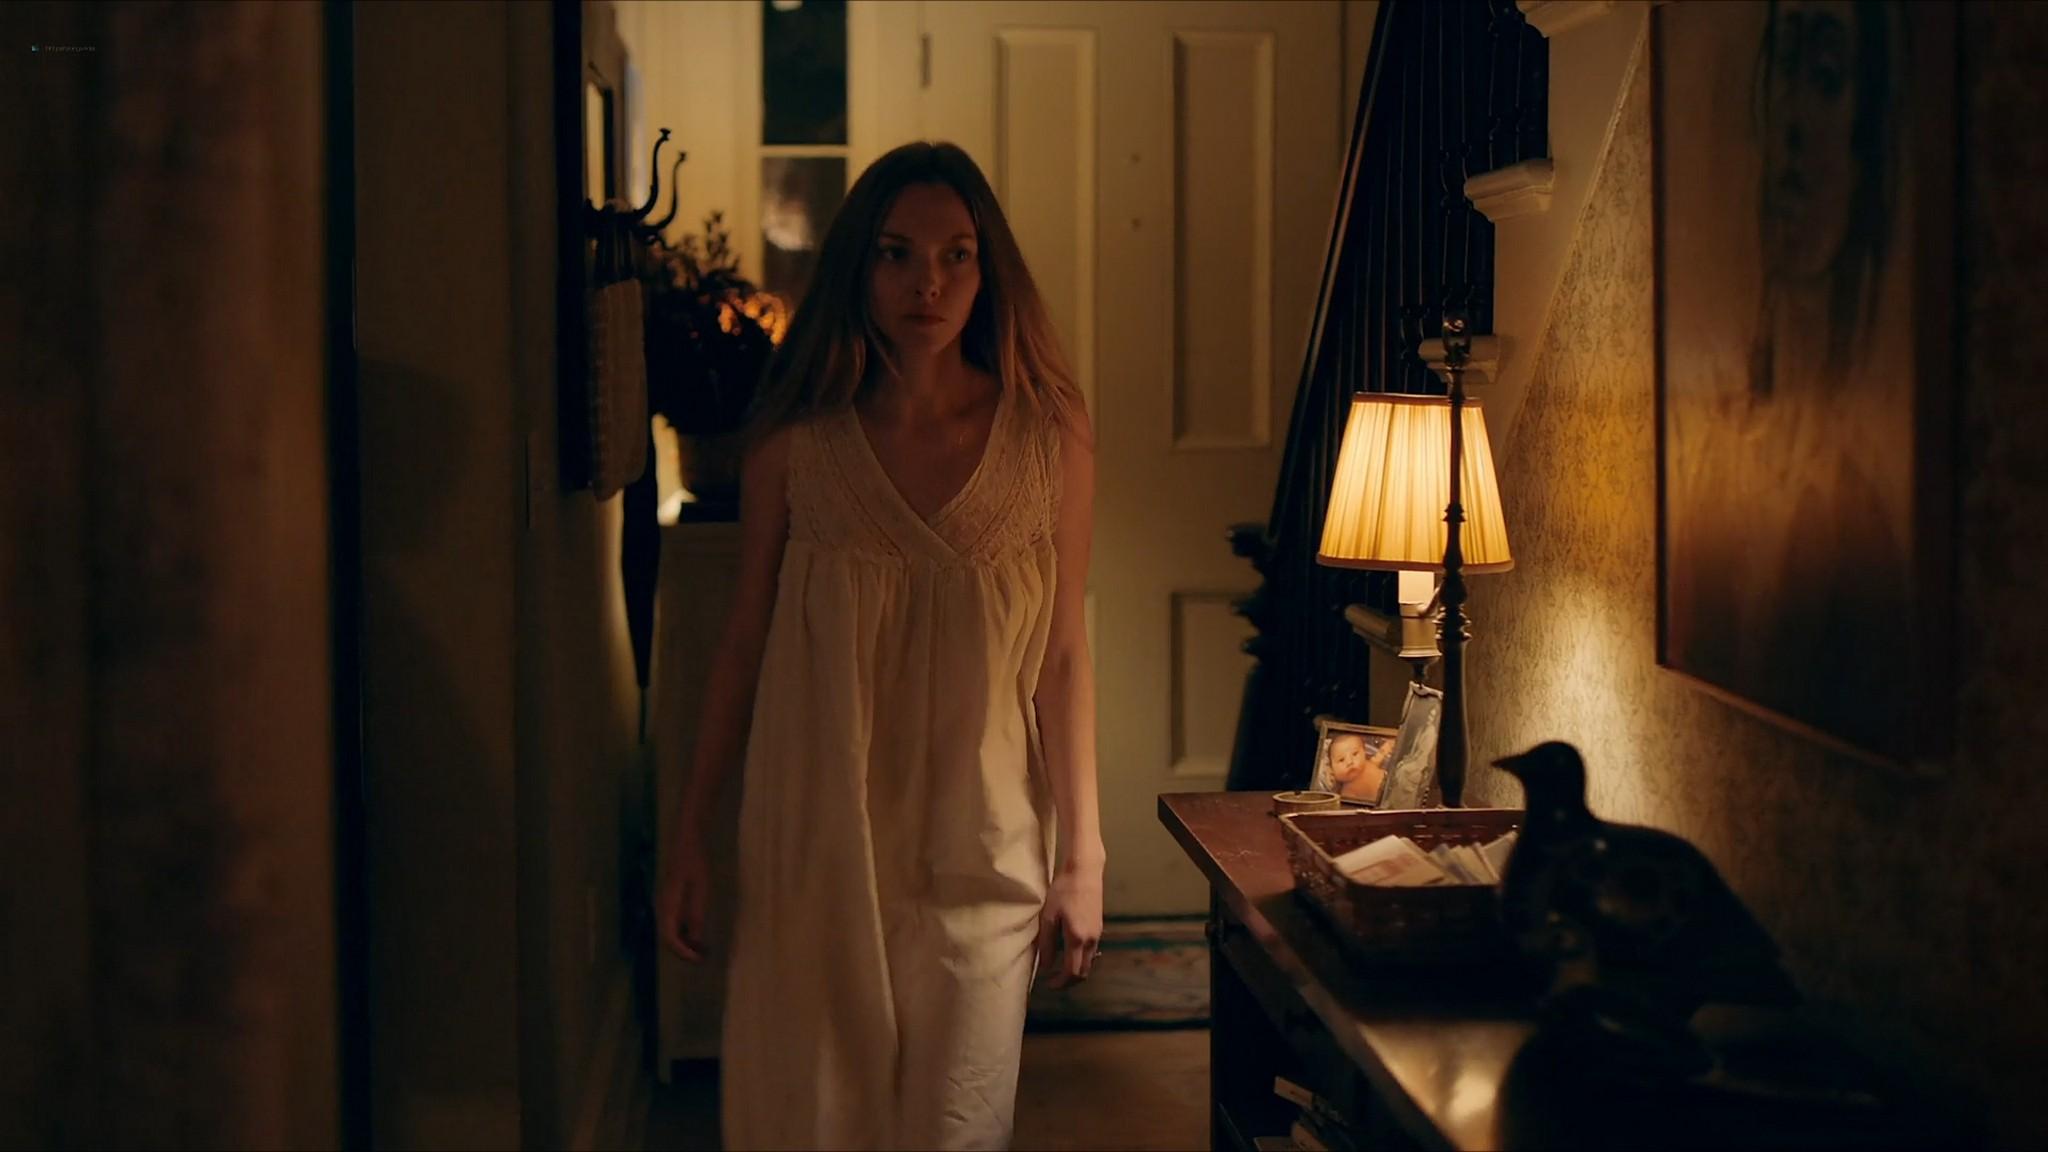 Amanda Seyfried hot Natalia Dyer sexy Things Heard Seen 2021 1080p Web 5